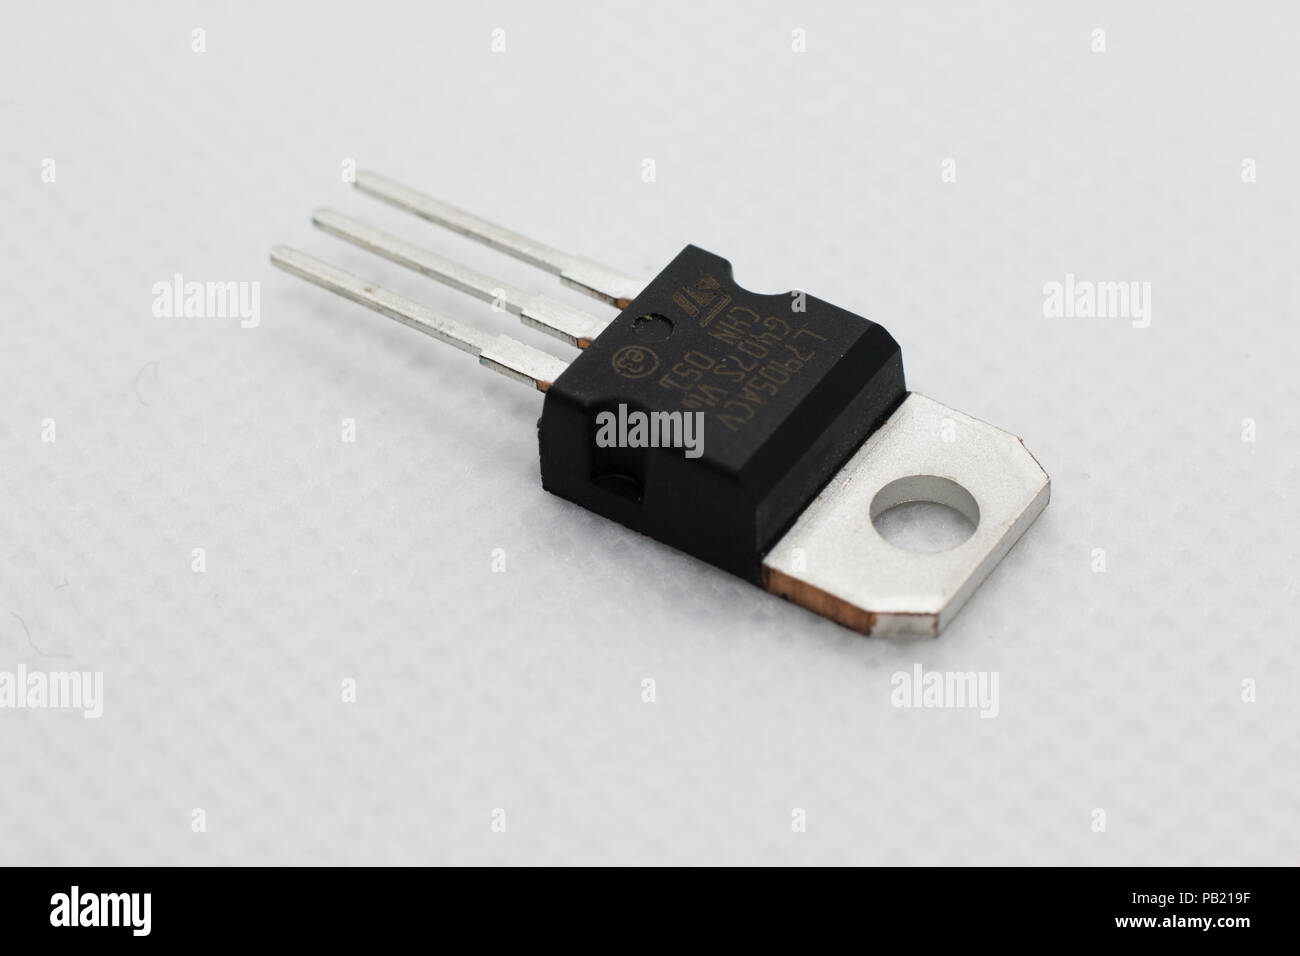 Voltage regulator on white background - Stock Image